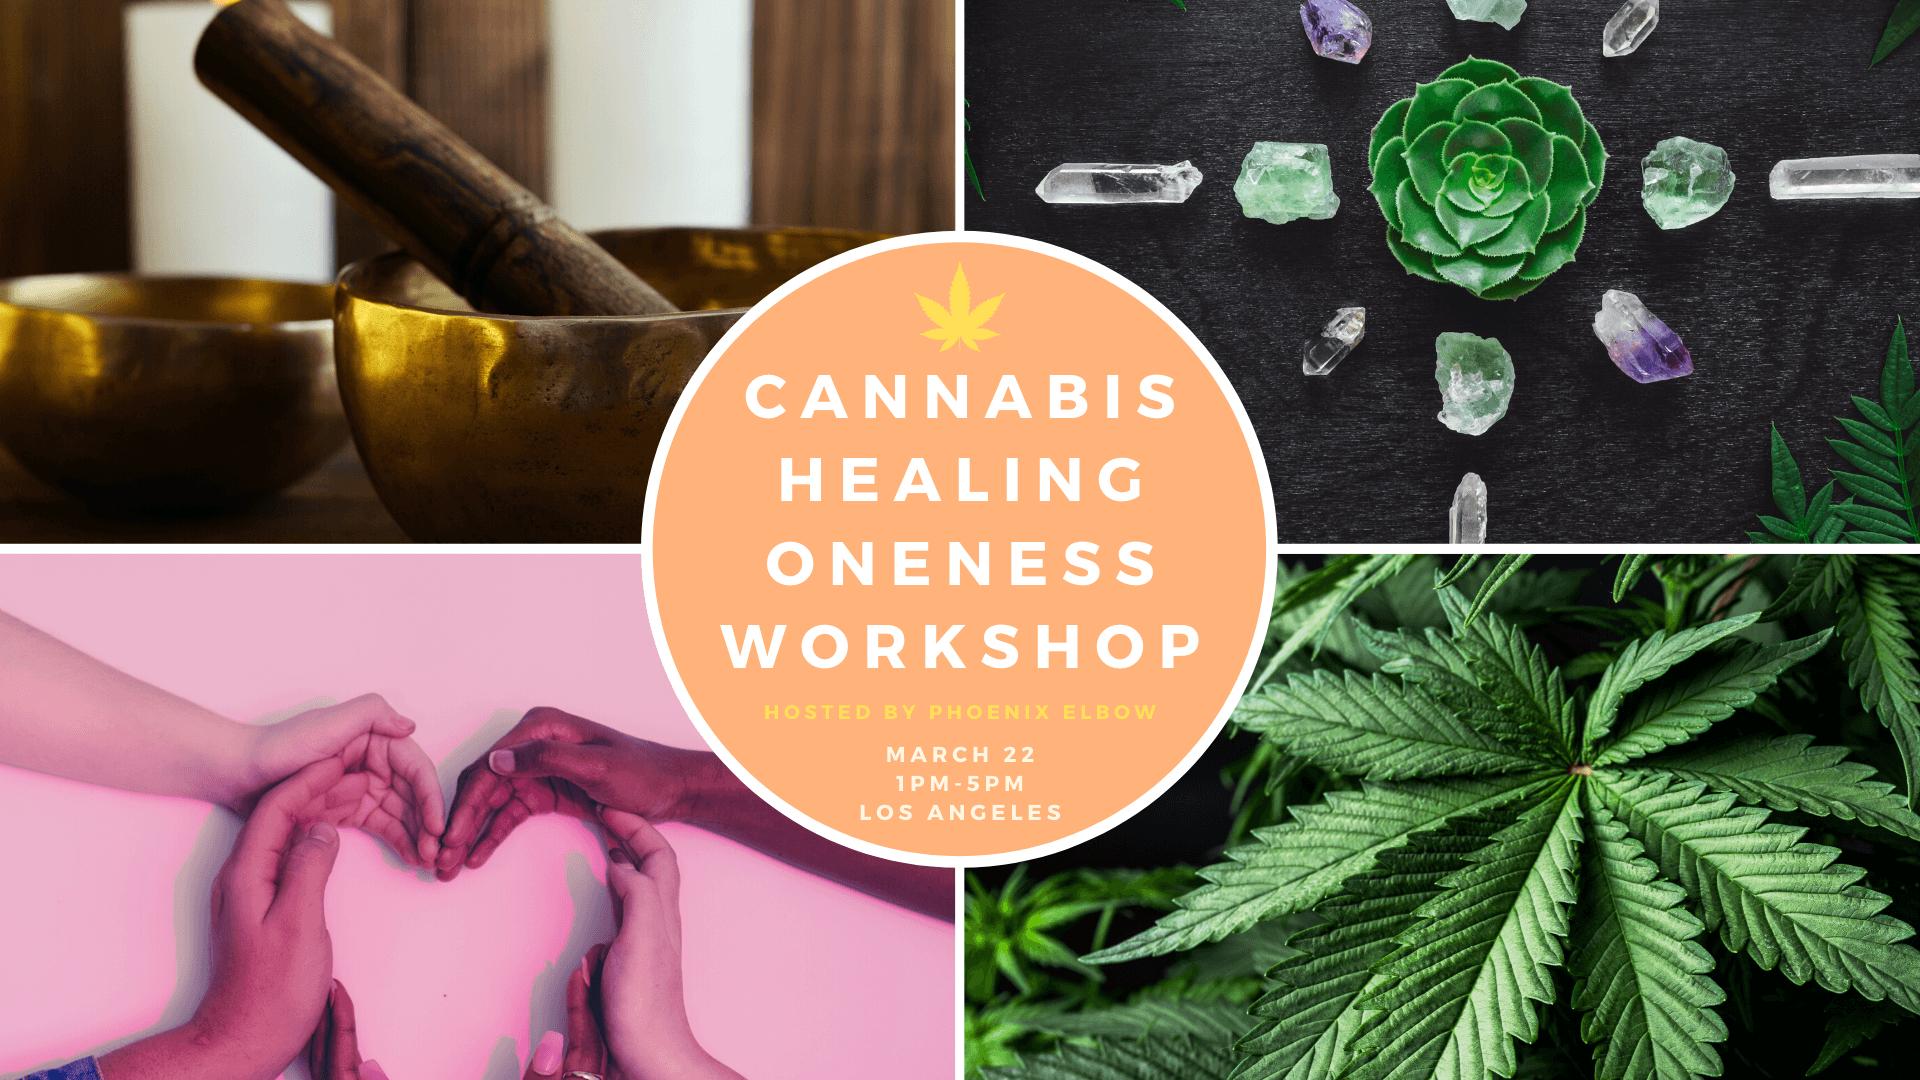 Cannabis Healing Oneness Workshop